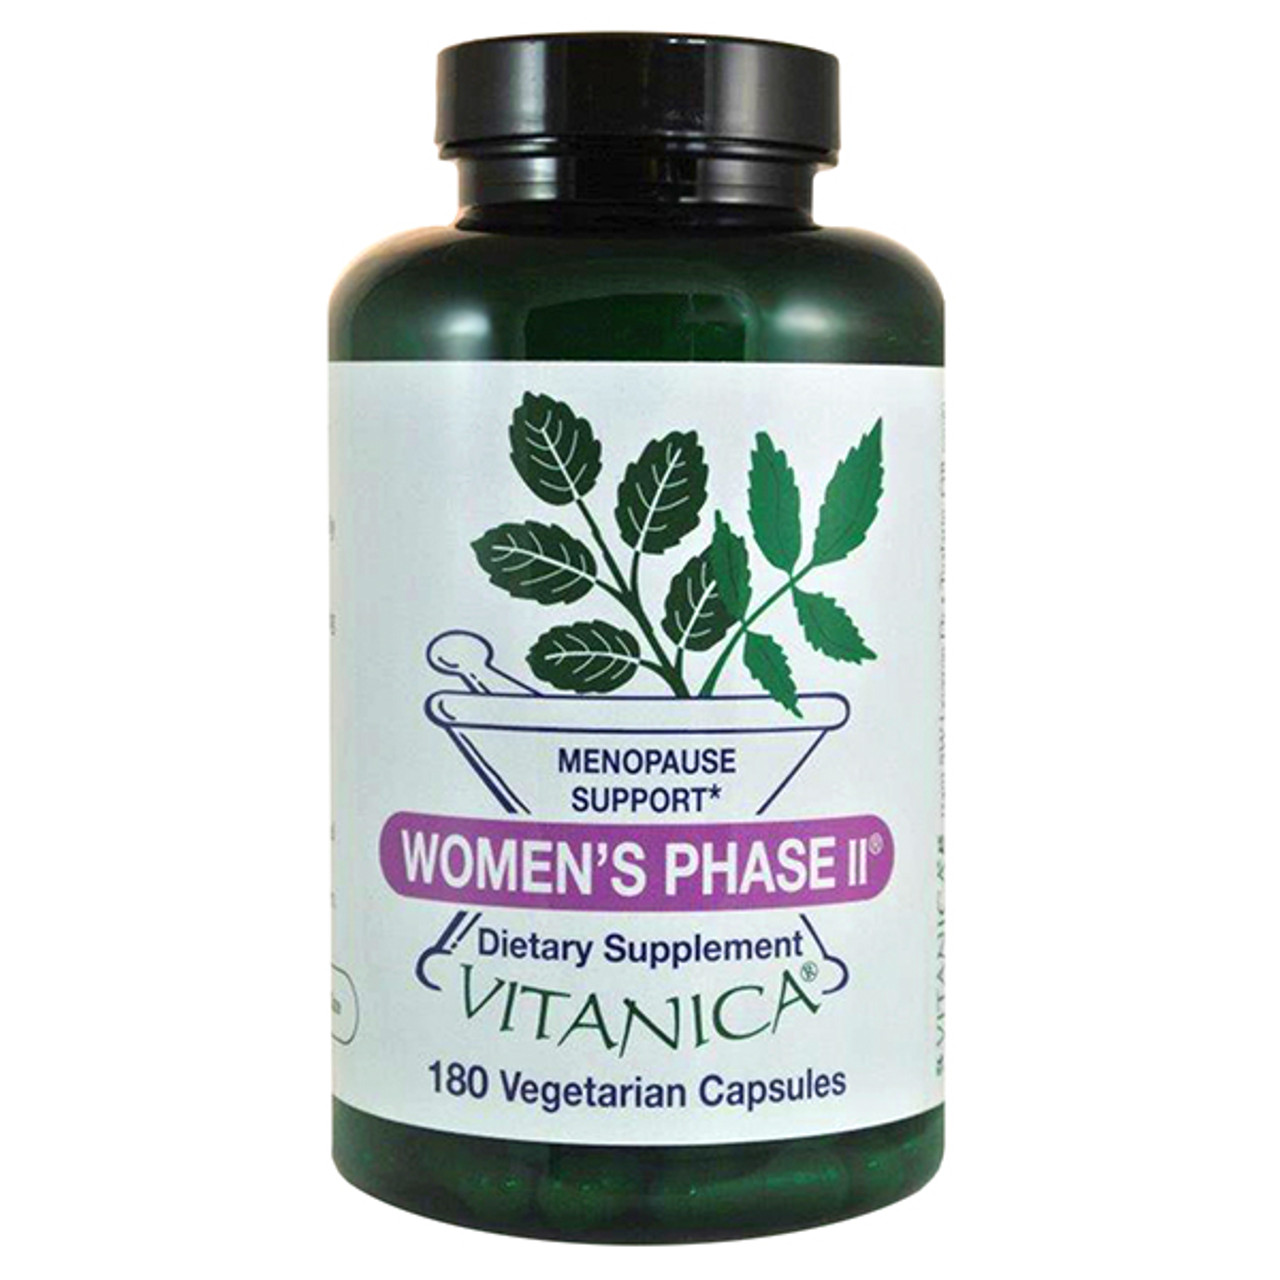 Women's Phase II 180 VCaps